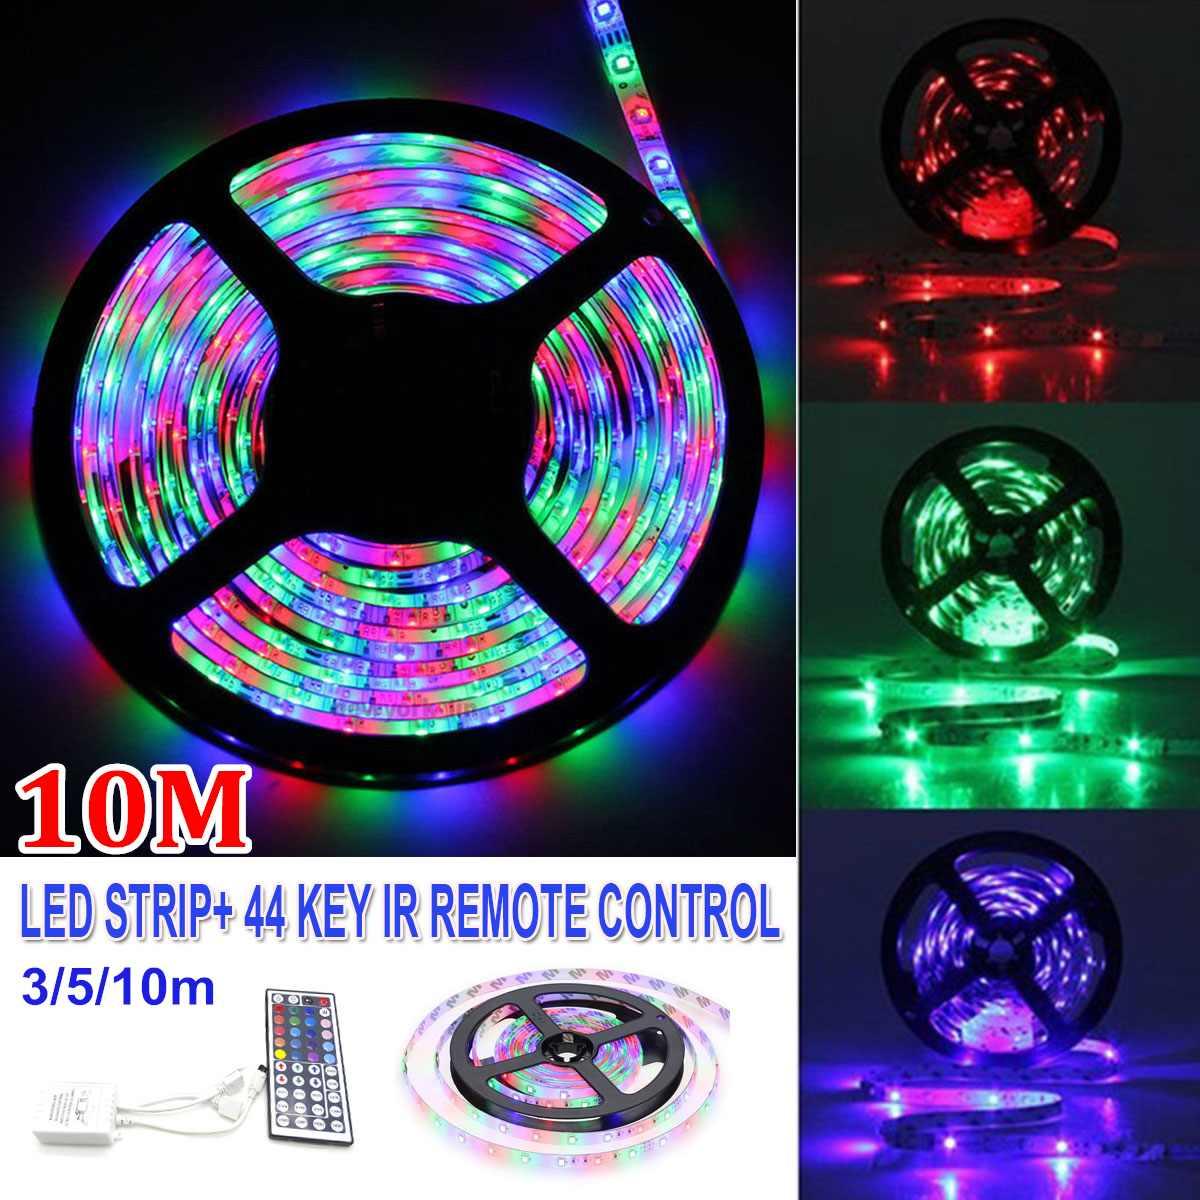 LED Strip UV Black Light 12V Fixtures Lamp Waterproof 5M 3528 Floodlight Outdoor